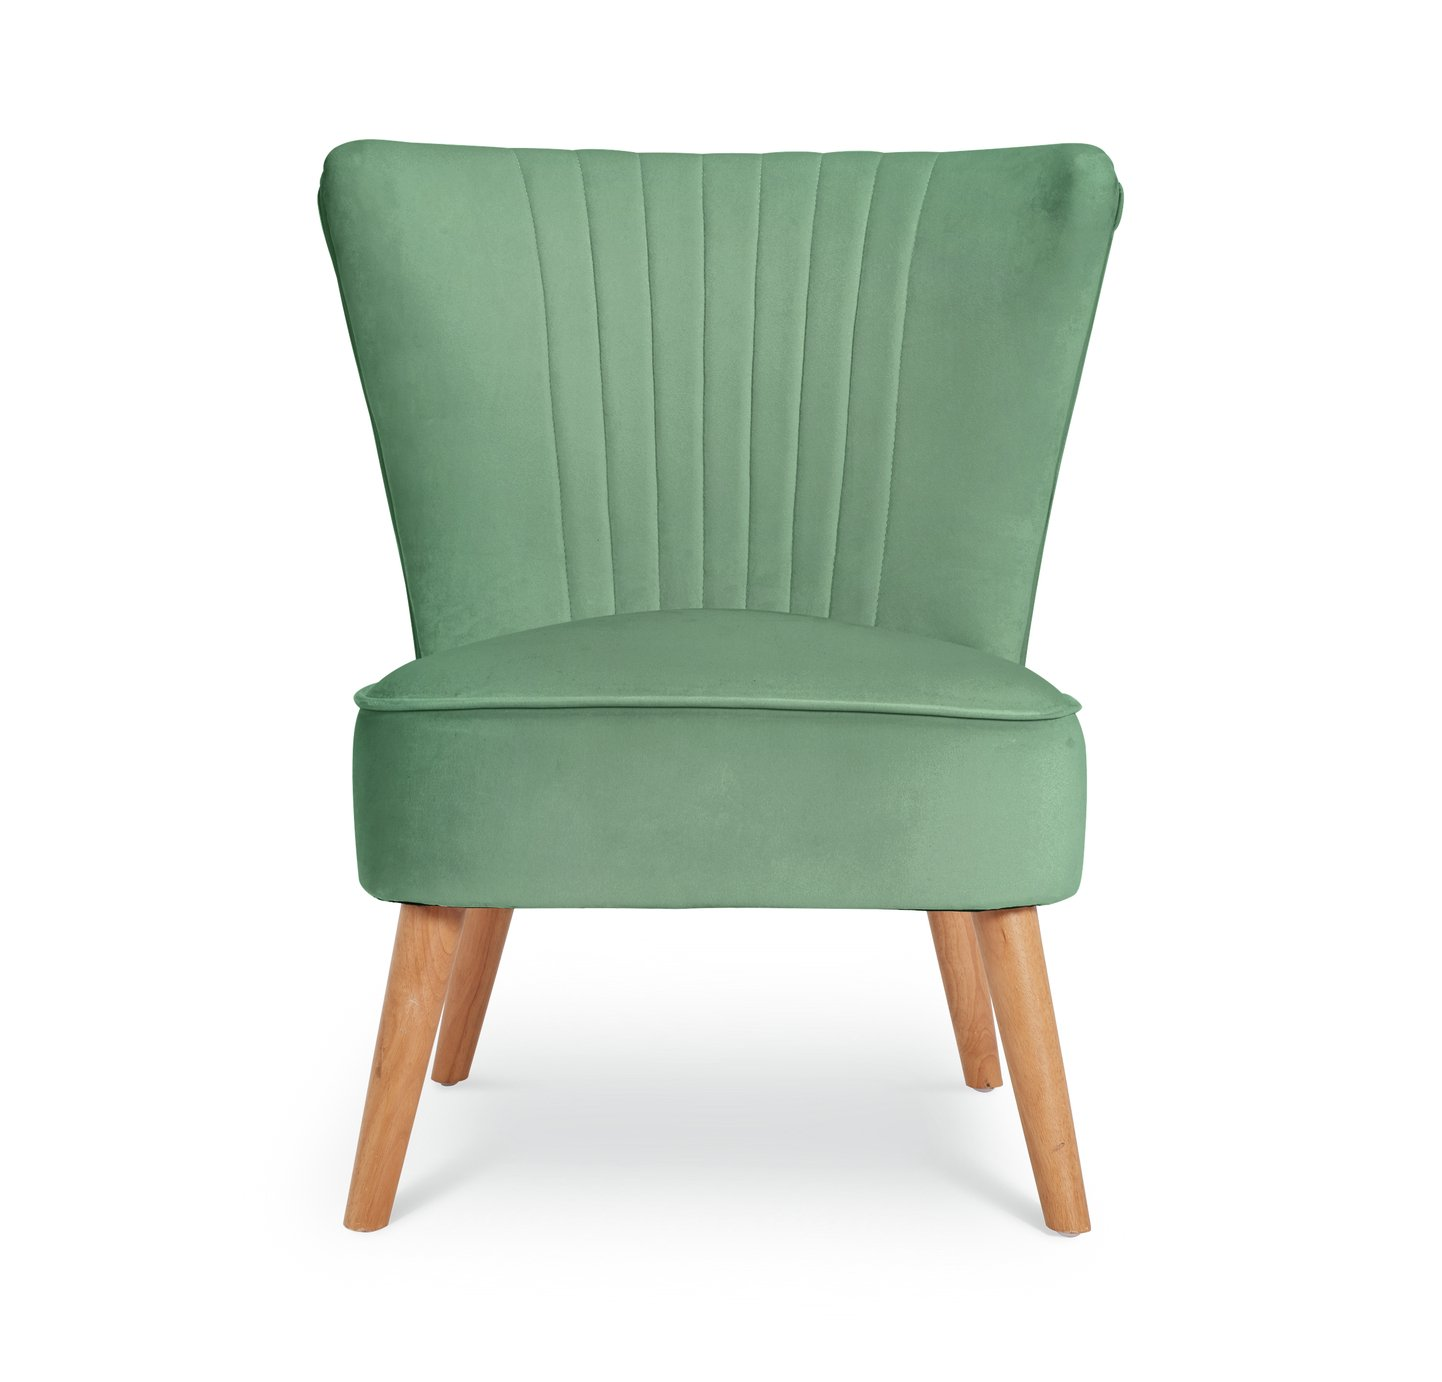 Argos Home Alana Velvet Shell Back Accent Chair - Mint